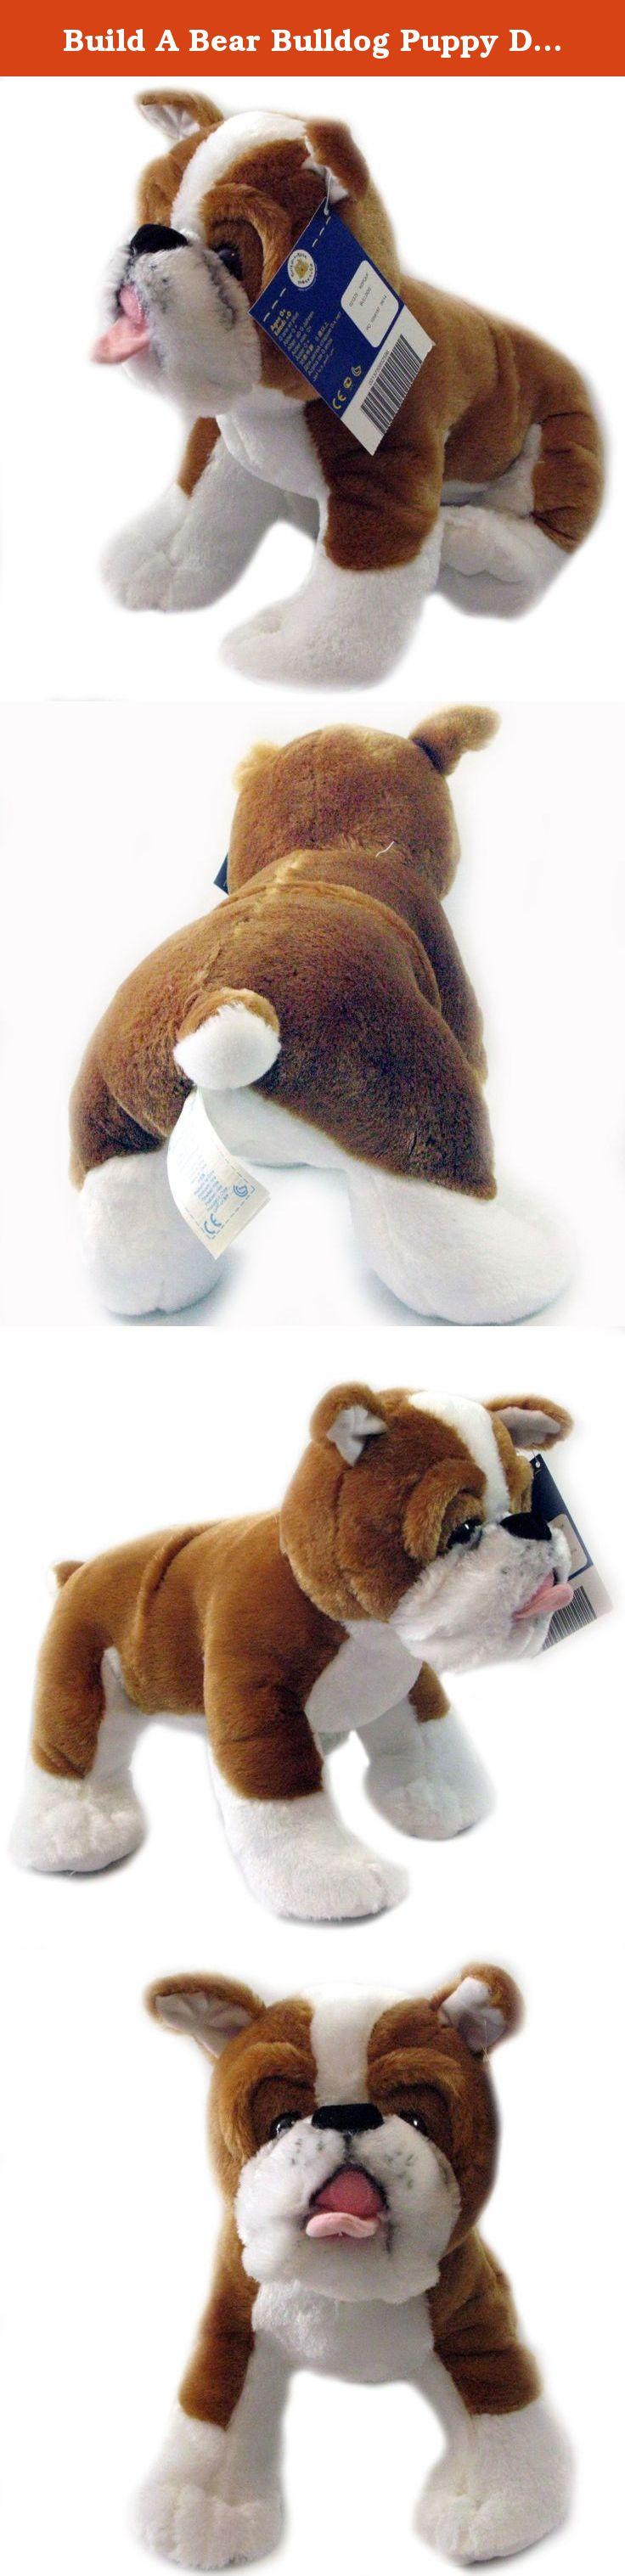 Build A Bear Bulldog Puppy Dog Plush Stuffed Animal 15 Inch By Build